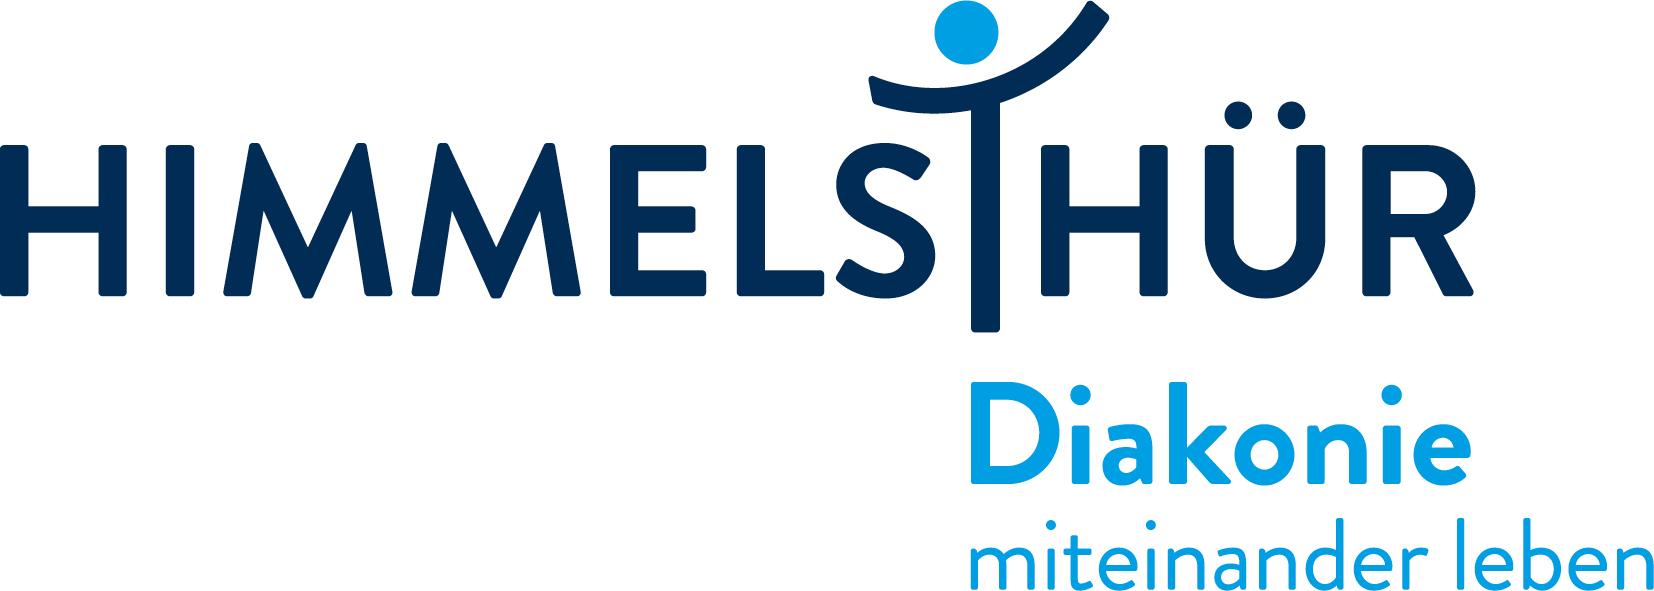 Logo: Diakonie Himmelsthür e.V.